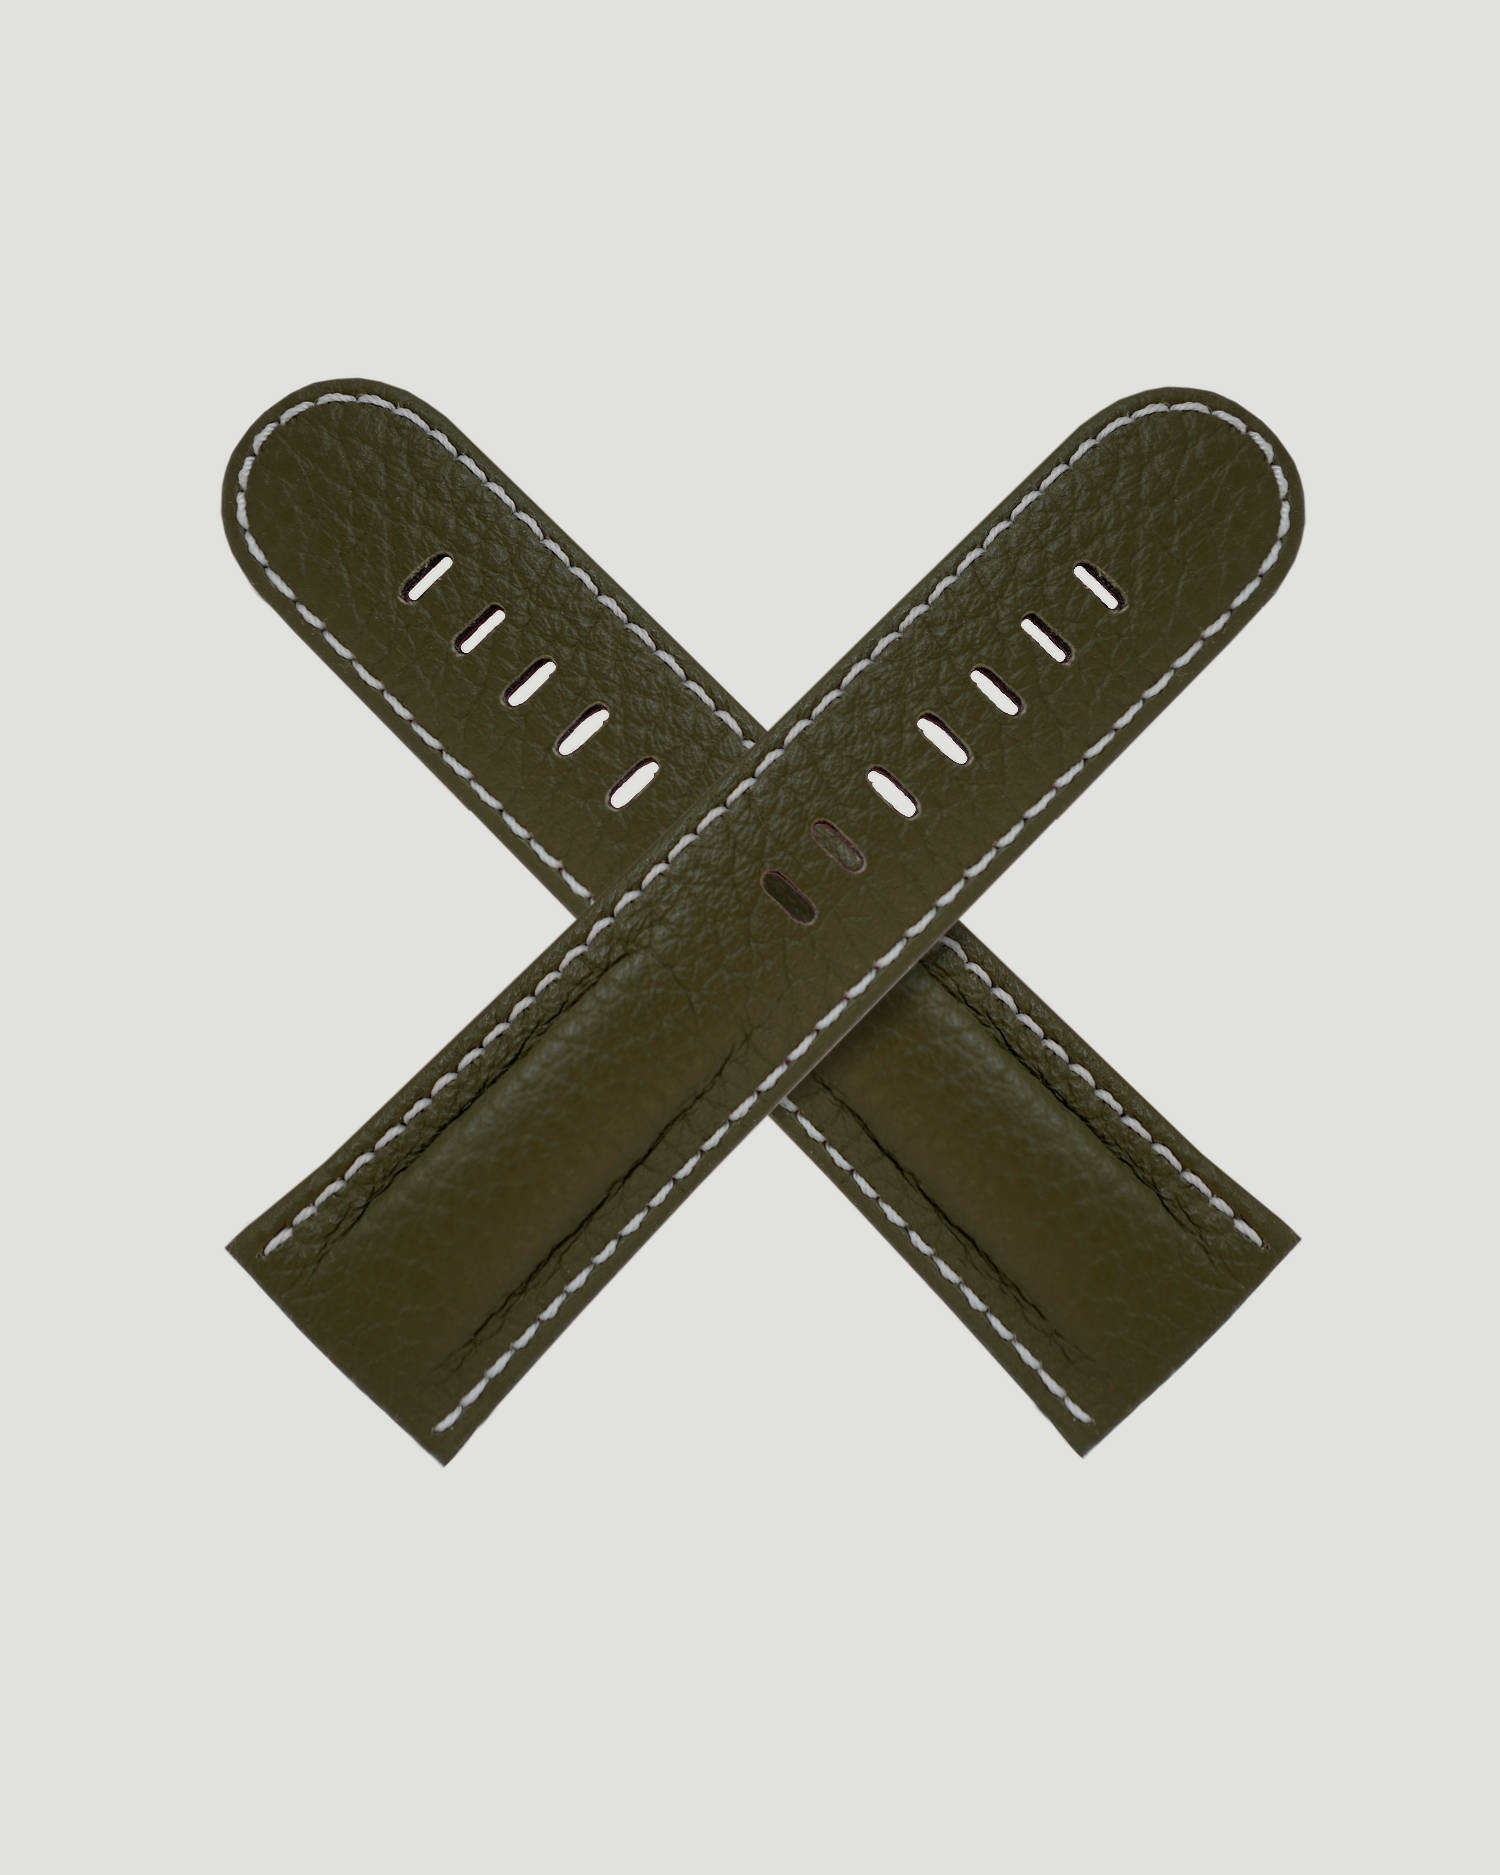 Green pebble strap